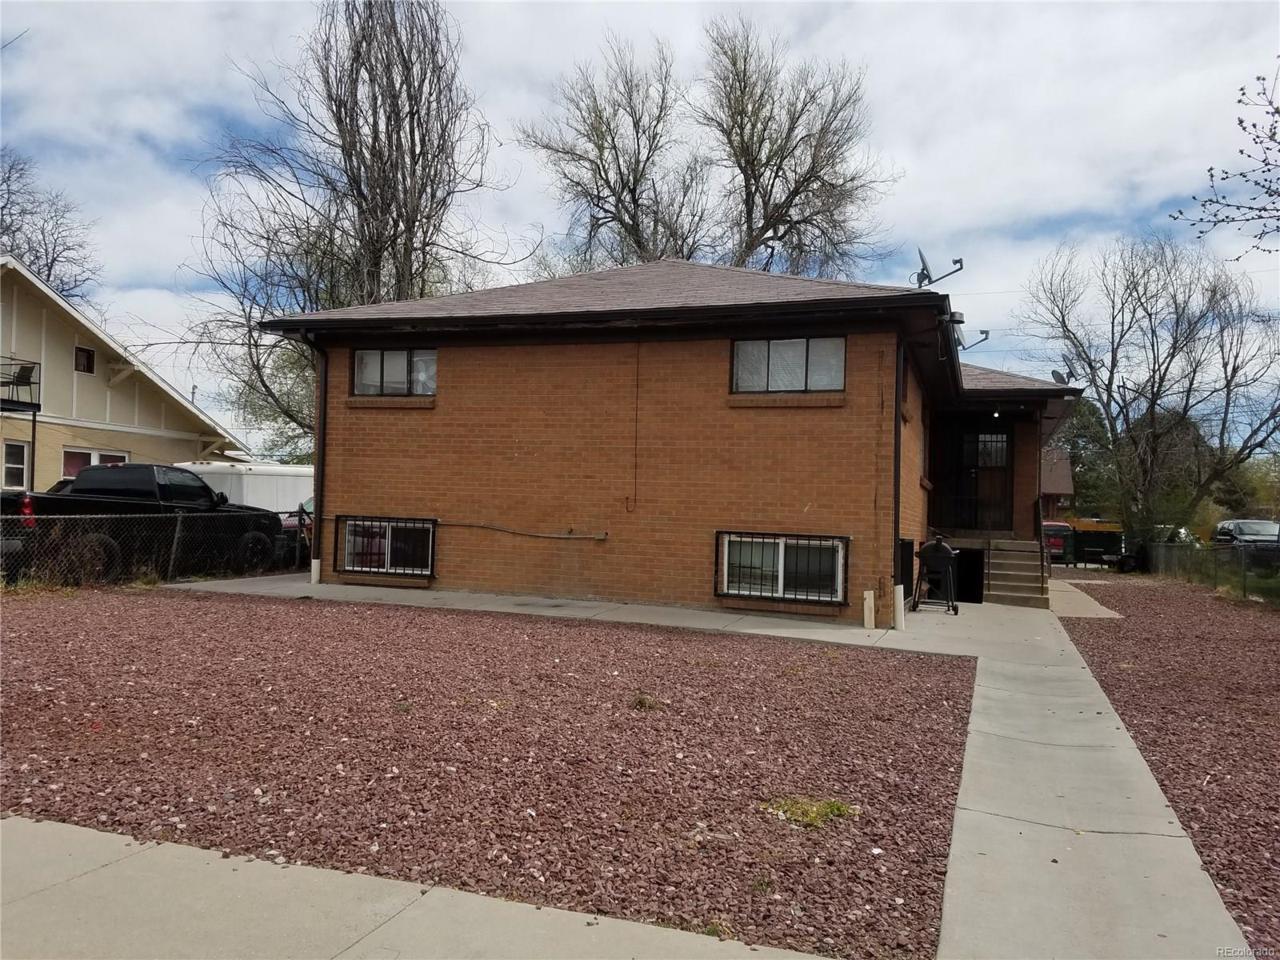 1430 Boston Street, Aurora, CO 80010 (MLS #1759568) :: 8z Real Estate